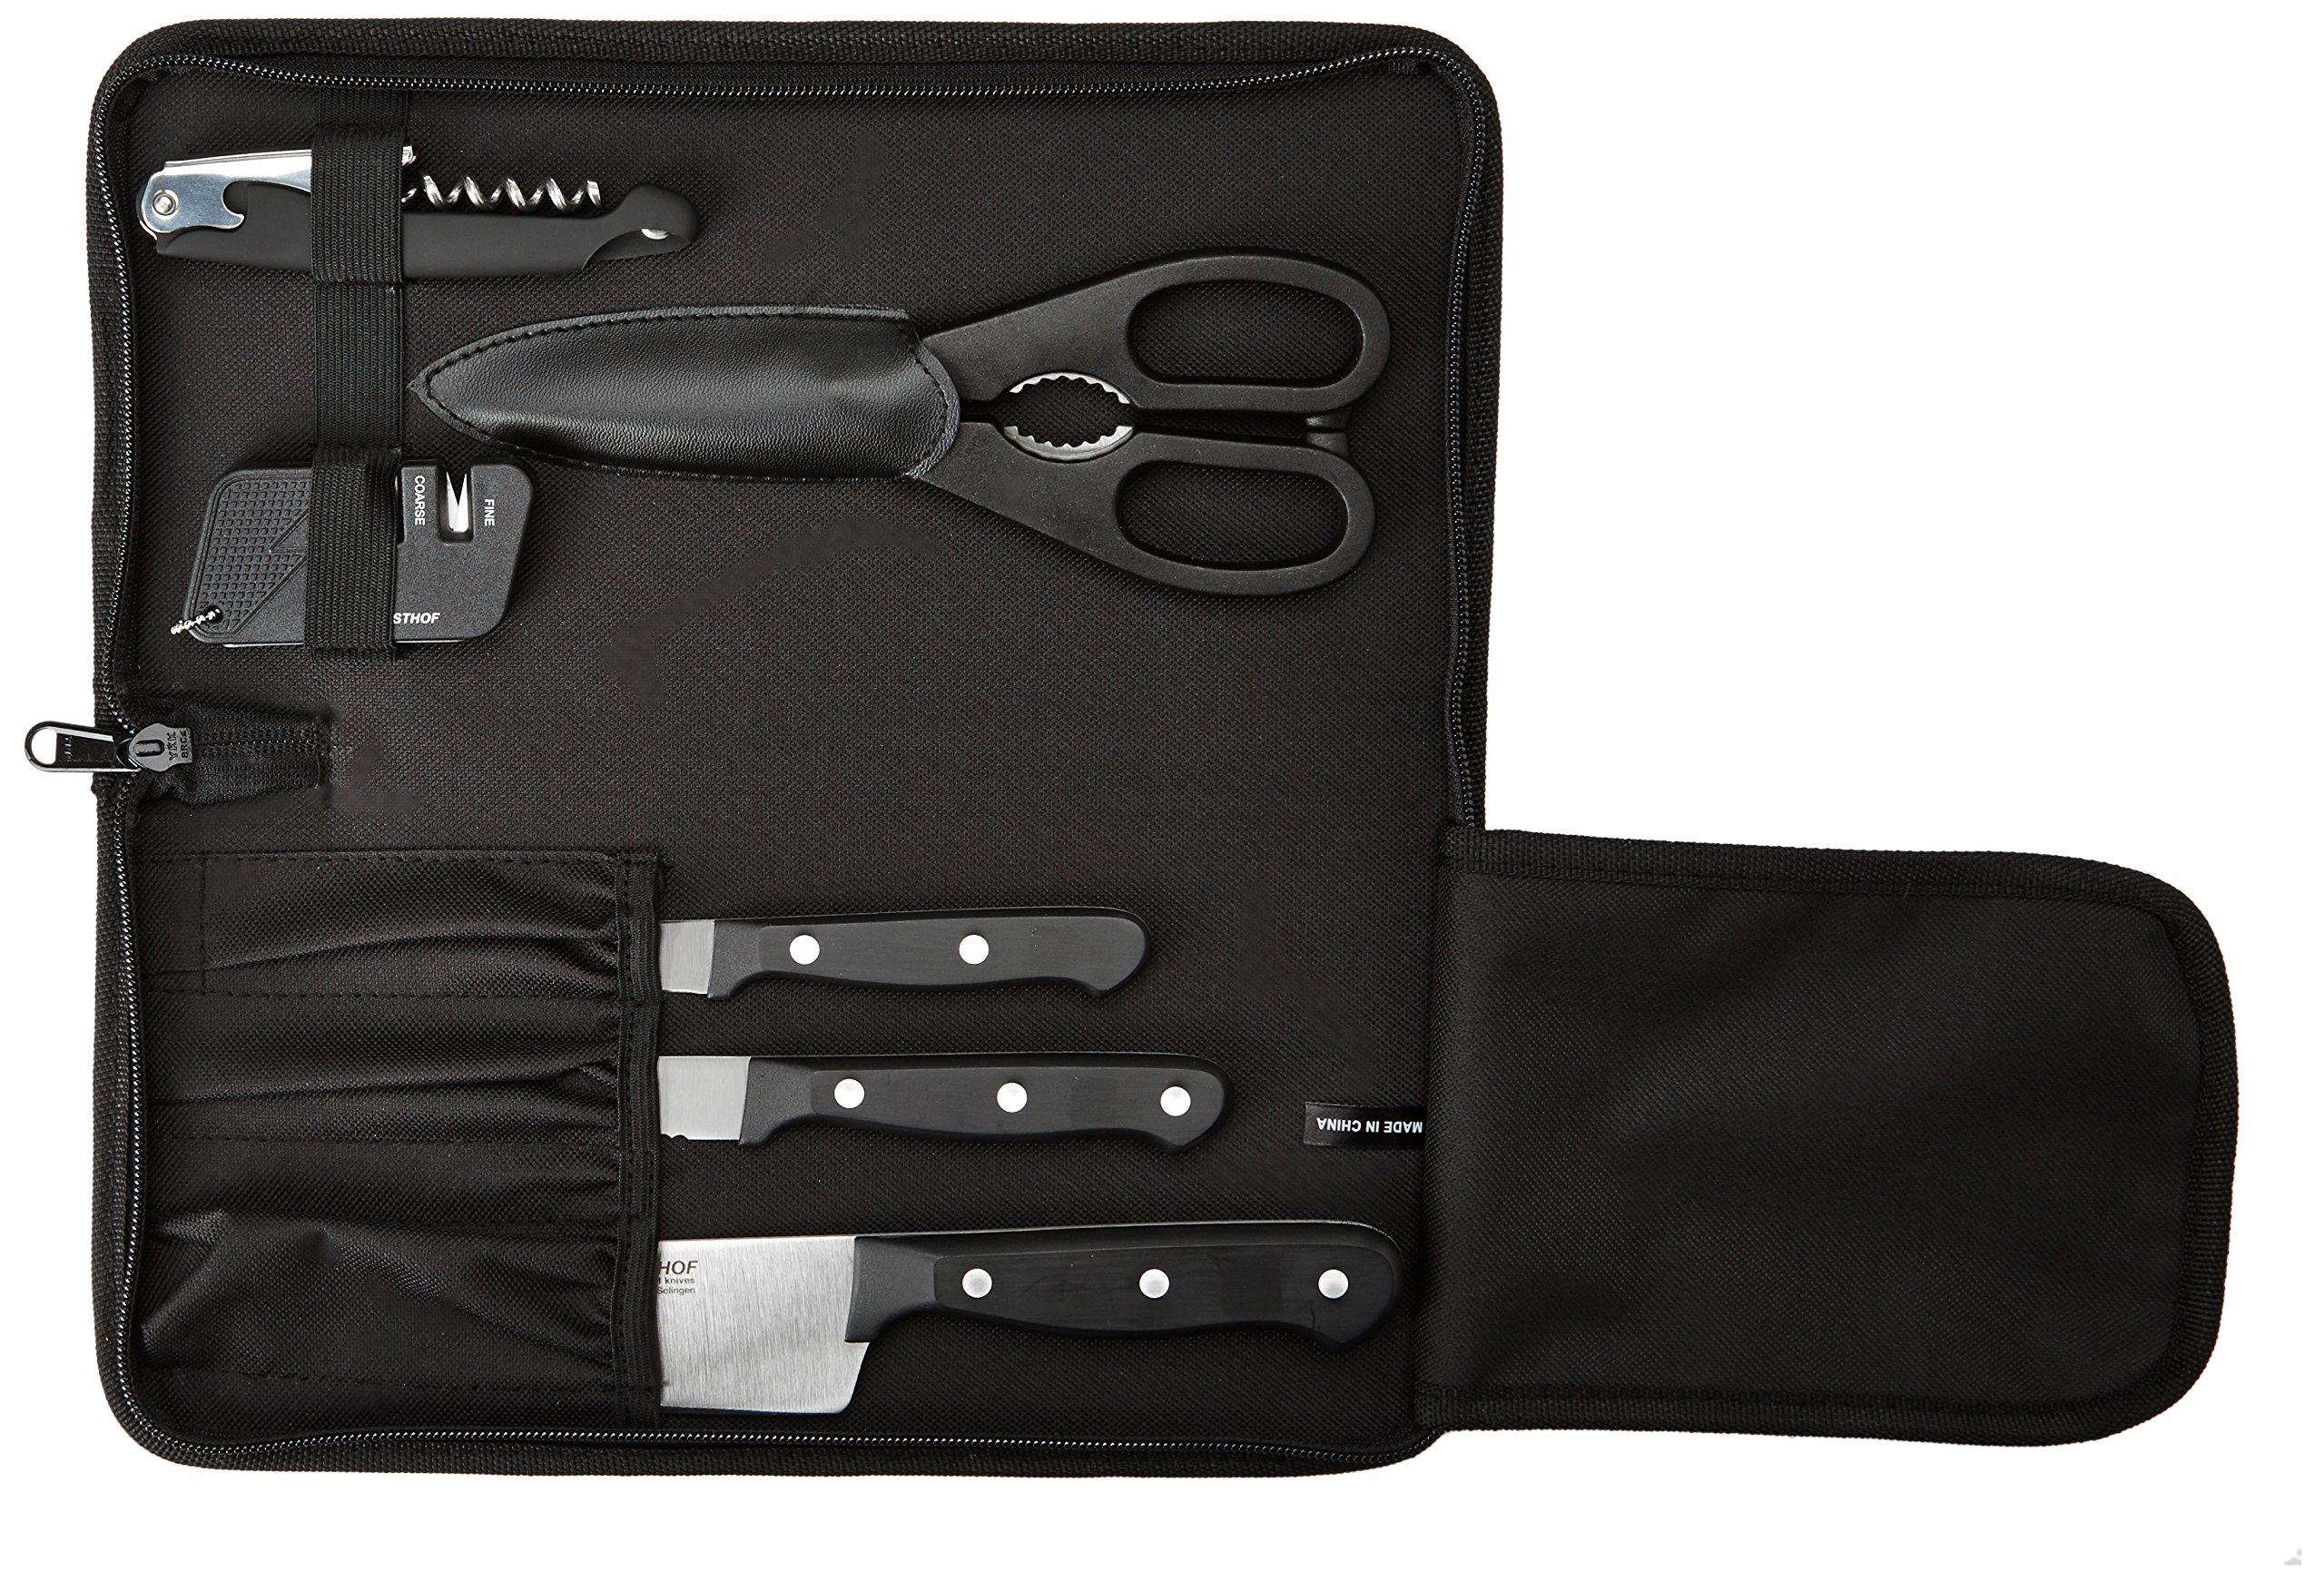 WÜSTHOF Gourmet Seven Piece Traveler Knife Set | 7-Piece German Knife Set with Traveler Case | Precise Laser Cut High Carbon Stainless Steel Kitchen Knife Set - Model 8957 by Wüsthof